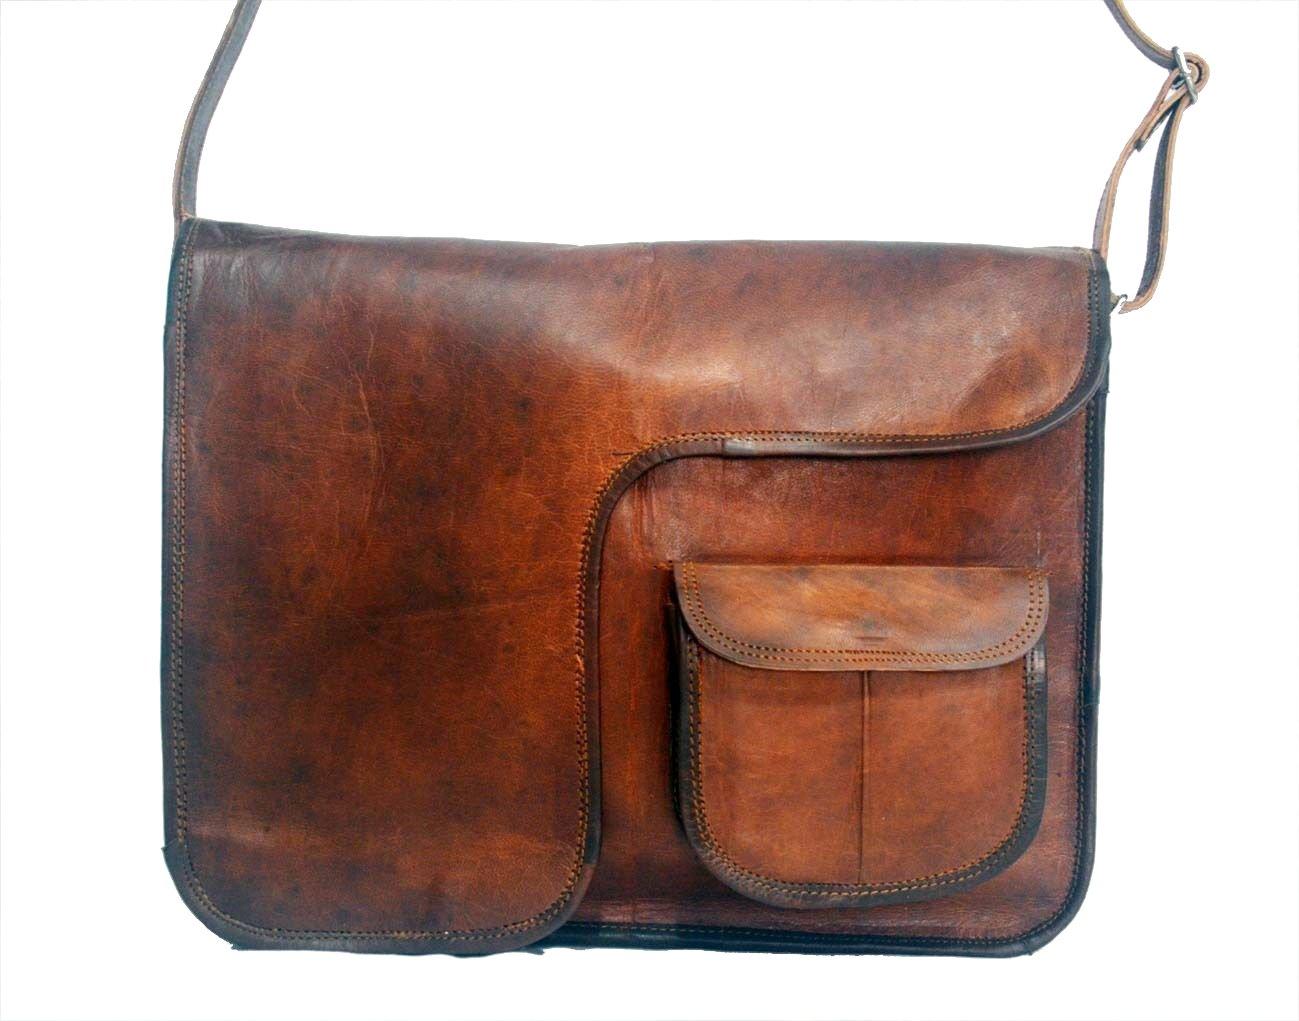 New Gvb Leather Messenger Bag Satchel Leather Men/'s Briefcase Laptop